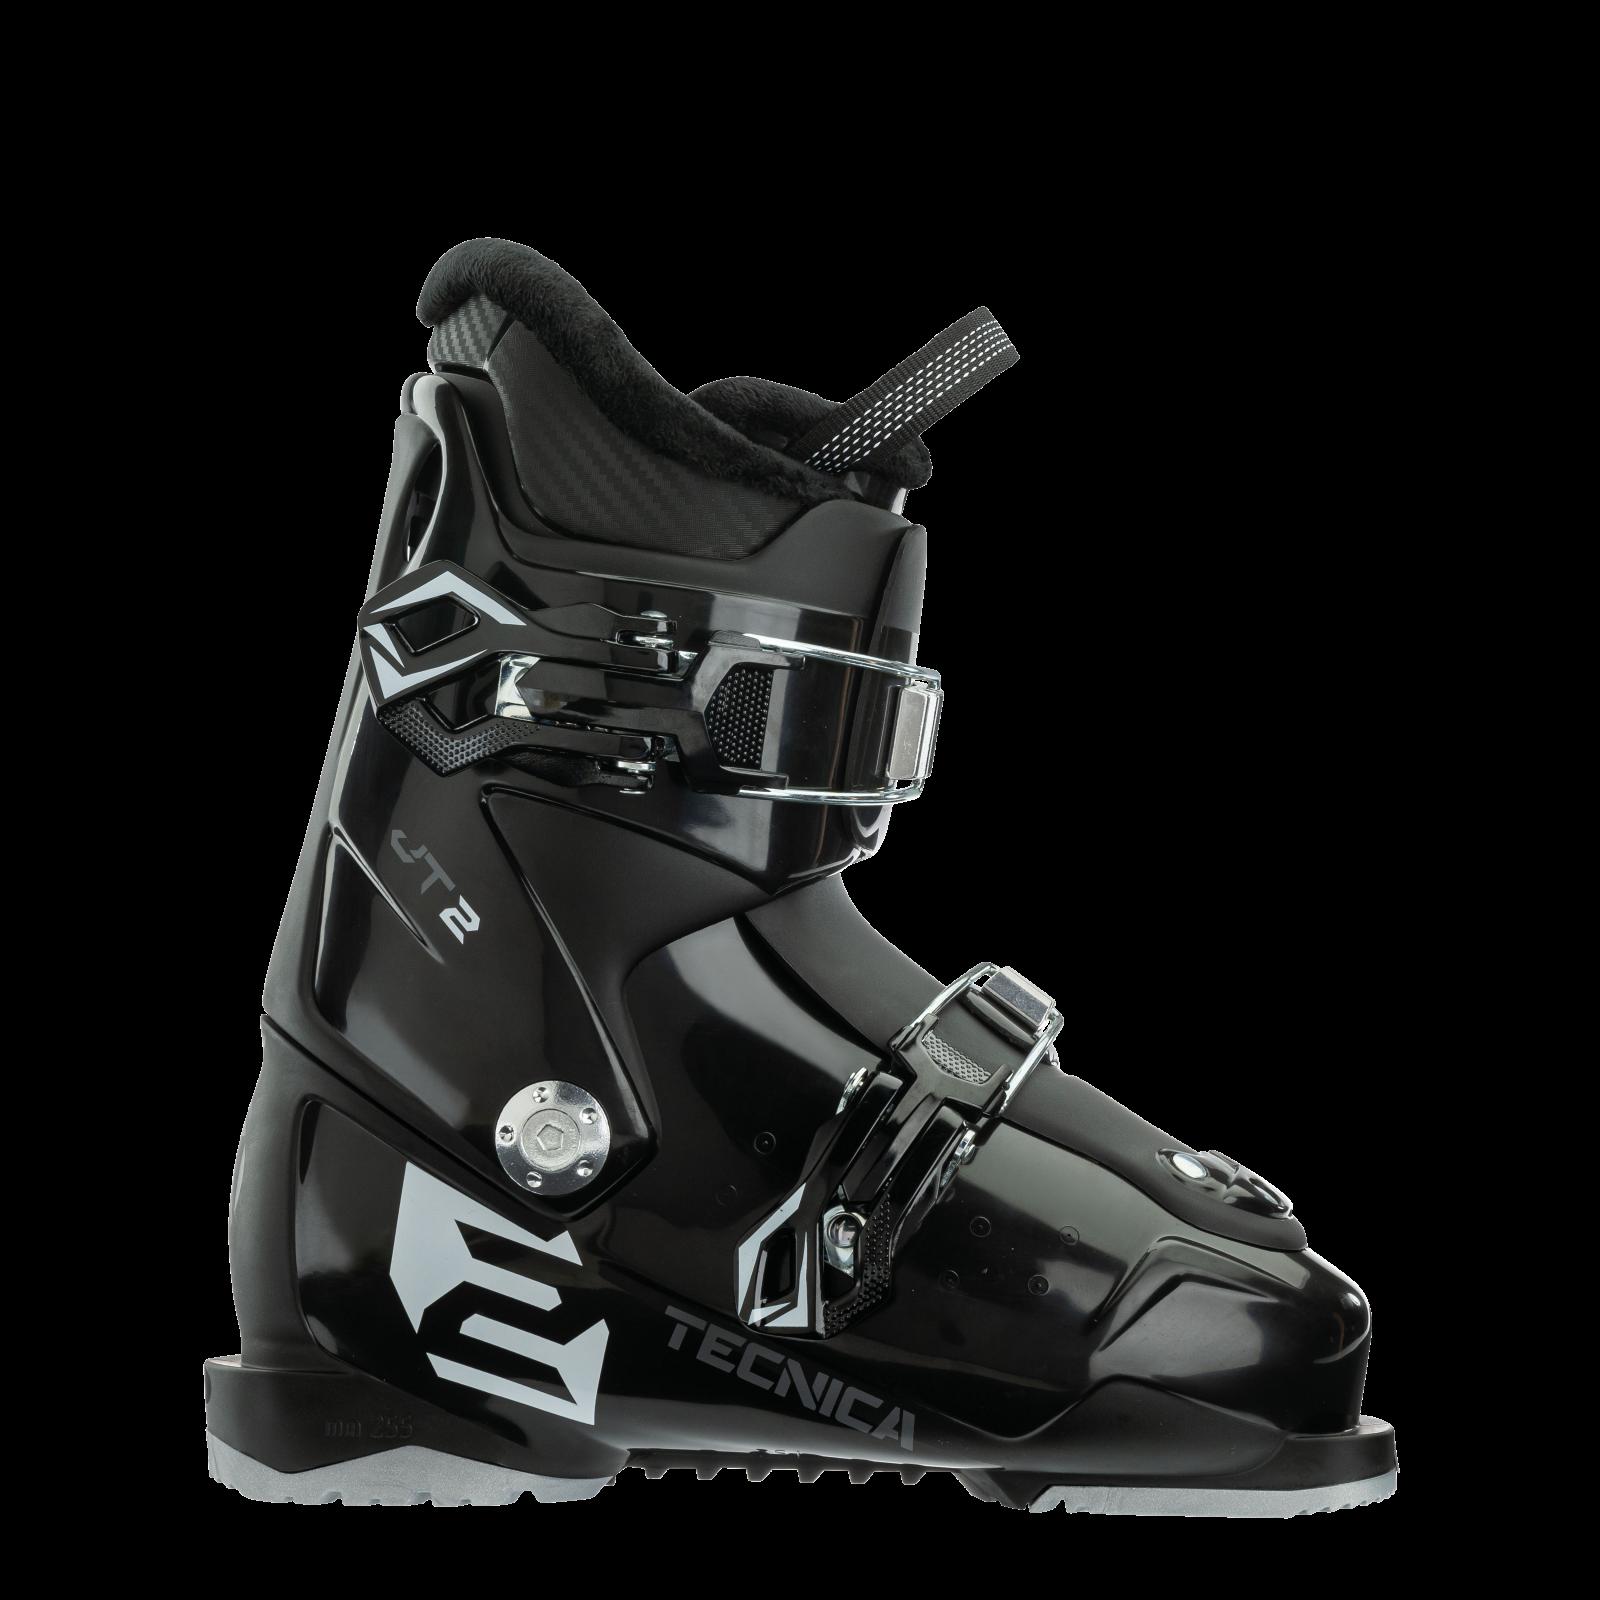 2021 Tecnica JT 2 Junior Ski Boots